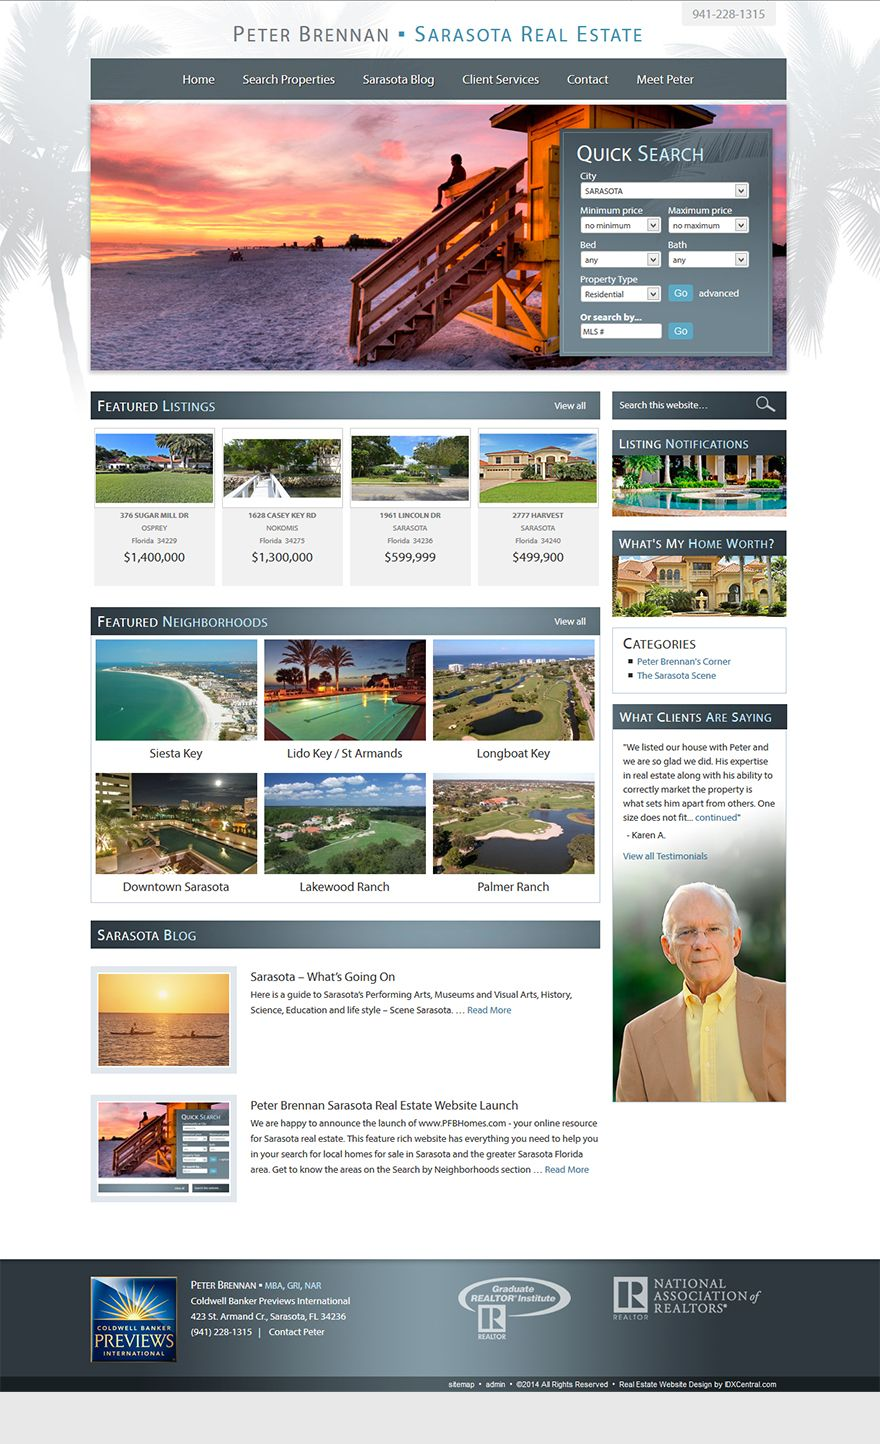 Florida Custom Real Estate Website Built On Wordpress For Realtor Peter Brennan Includes Sarasota Real Estate Real Estate Website Real Estate Website Design